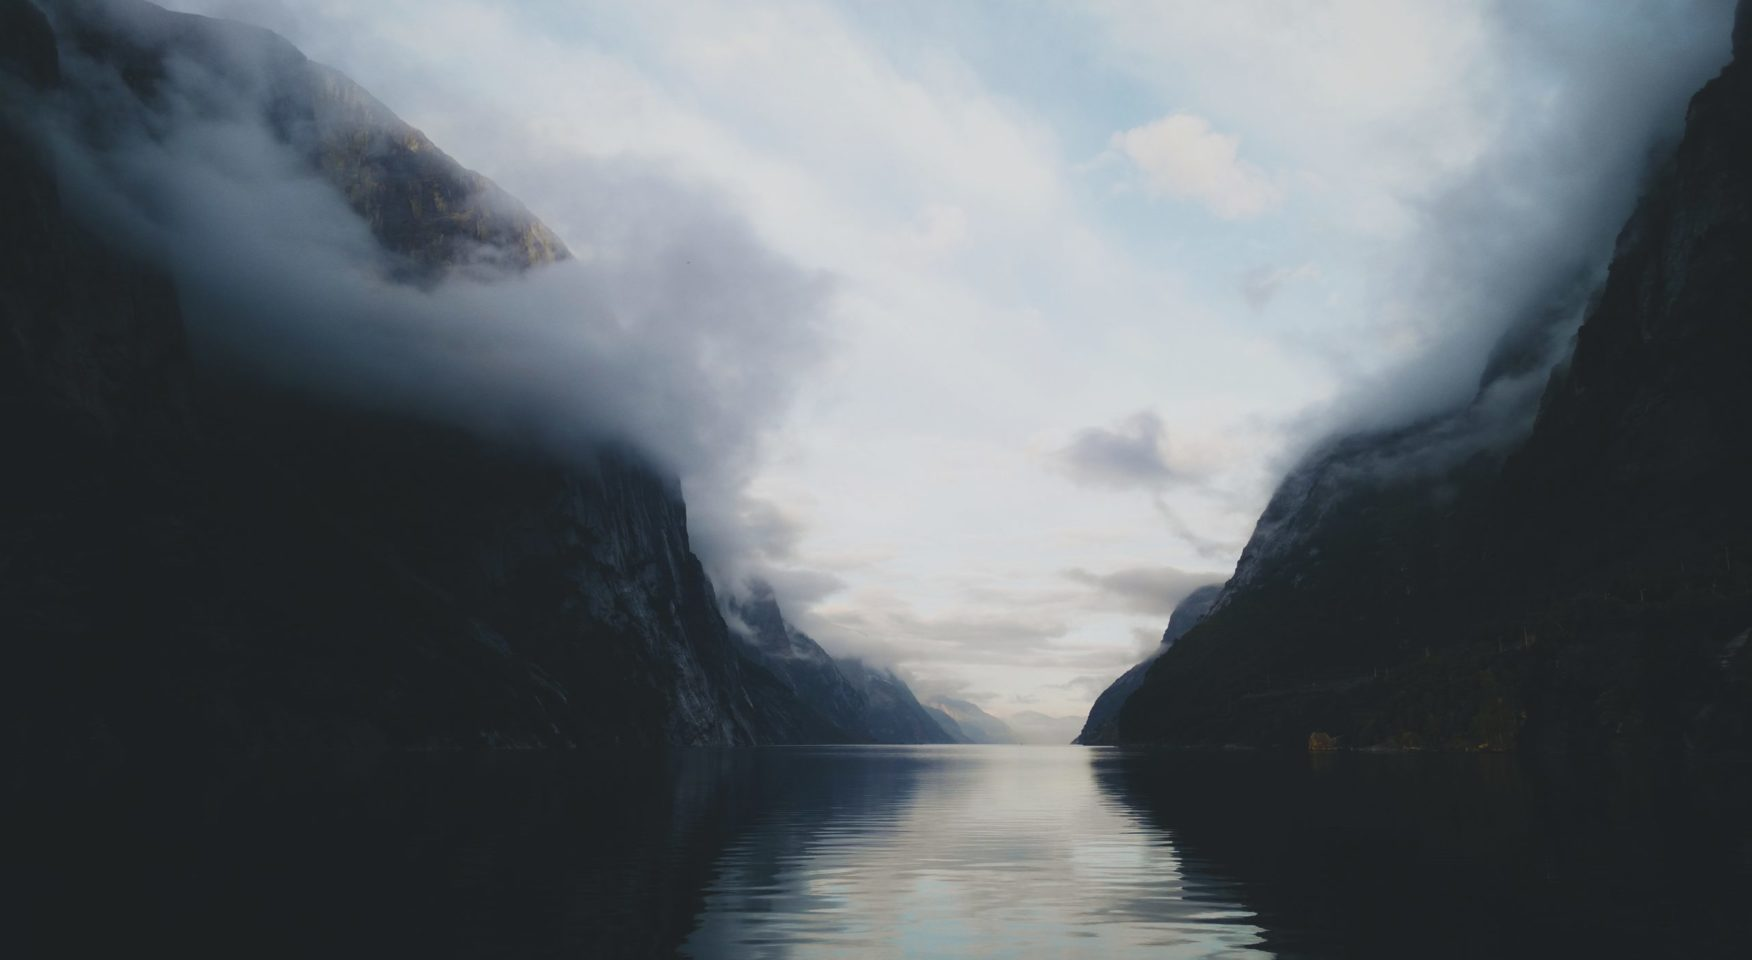 River winding through misty mountain pass